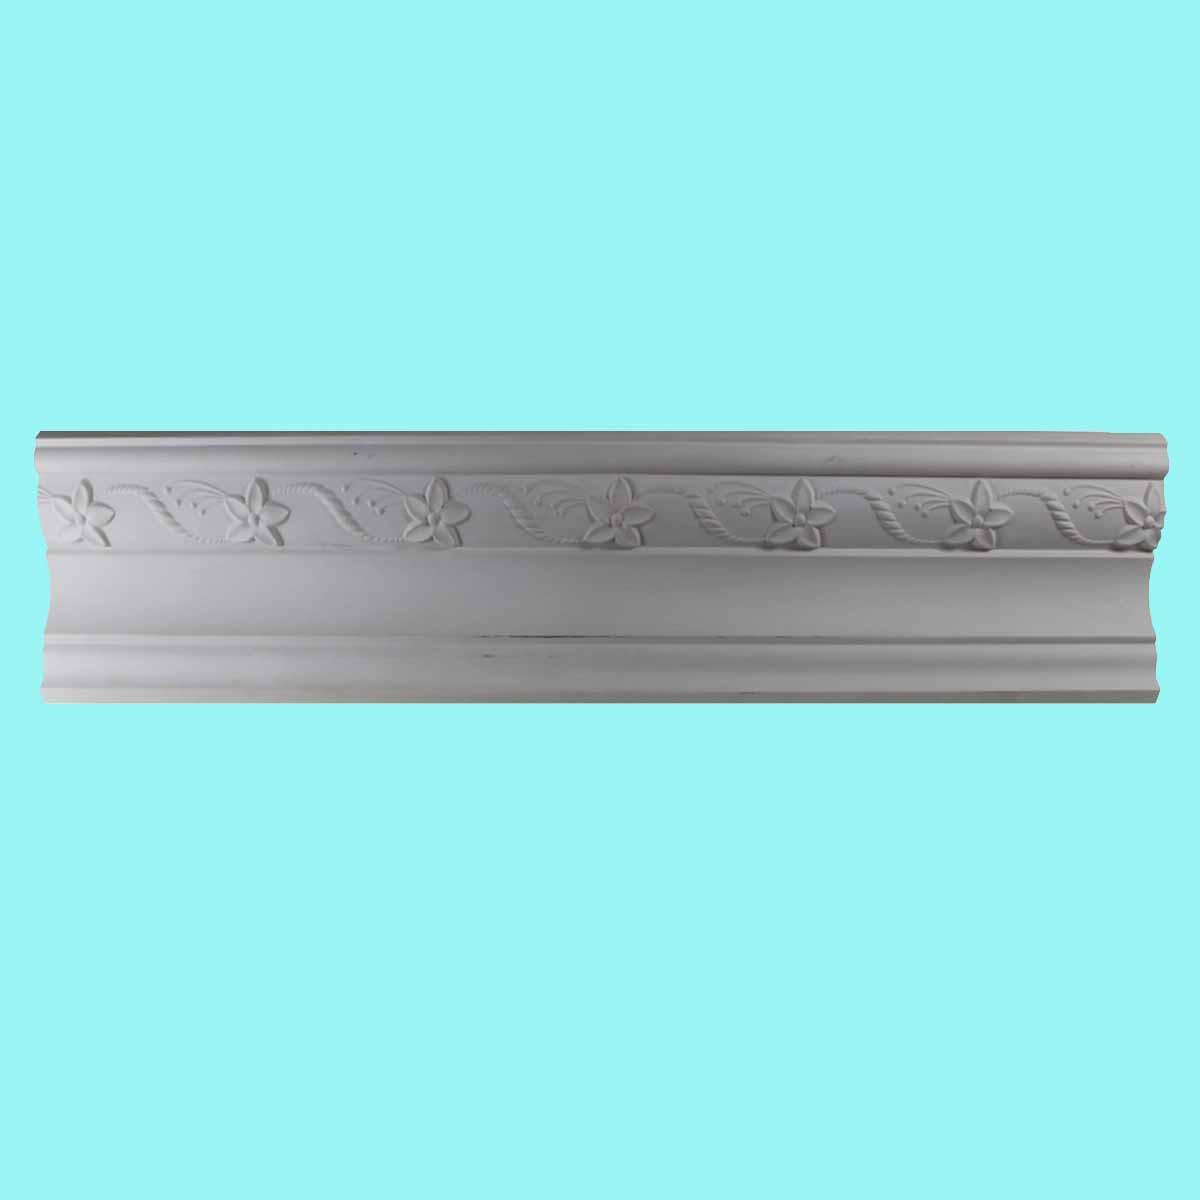 Cornice White Urethane Sample of 12416 24 Cornice Cornice Moulding Cornice Molding